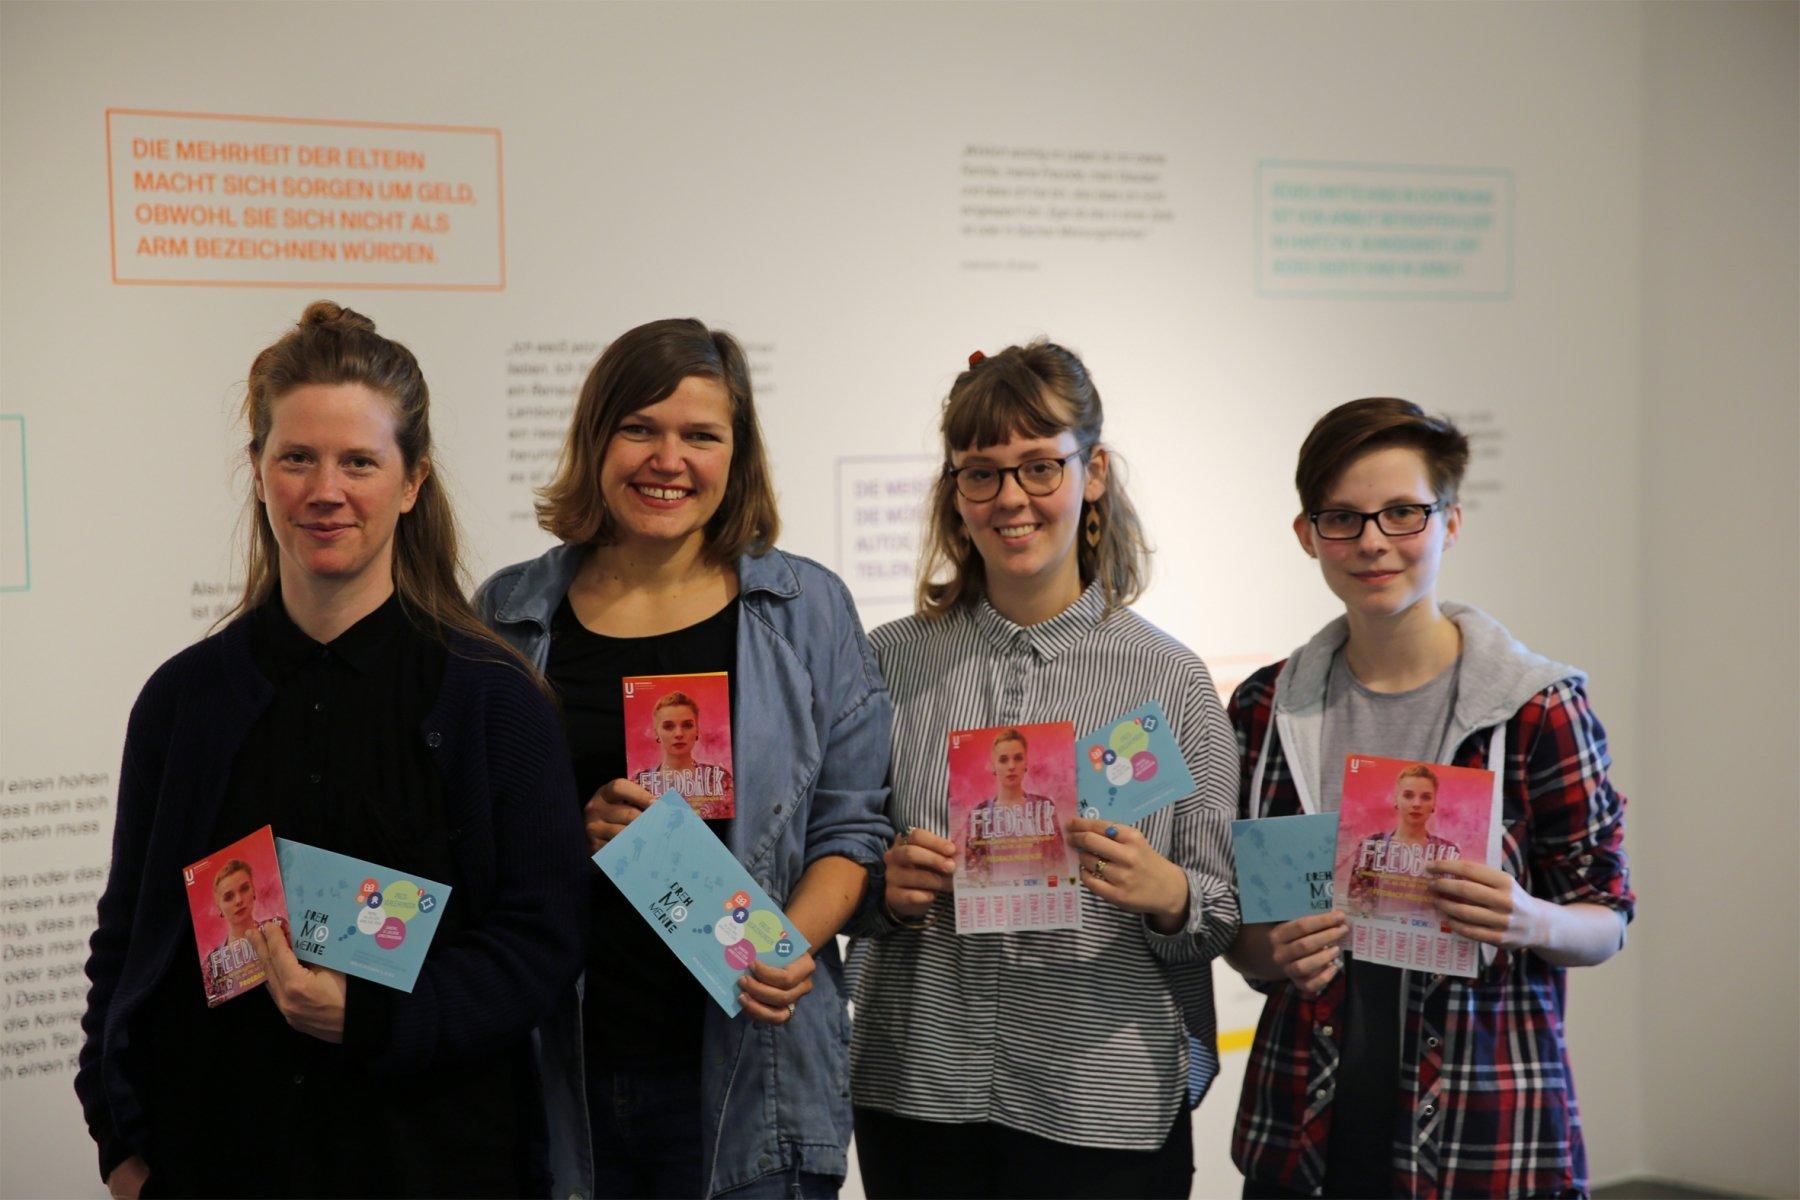 (v. l.) Vera Schöpfer, Henrike Becklas, Franka Schlupp (FSJlerin) und Nadine Seidel vom Jugendteam des Festivals. (Foto: Stadt Dortmund)